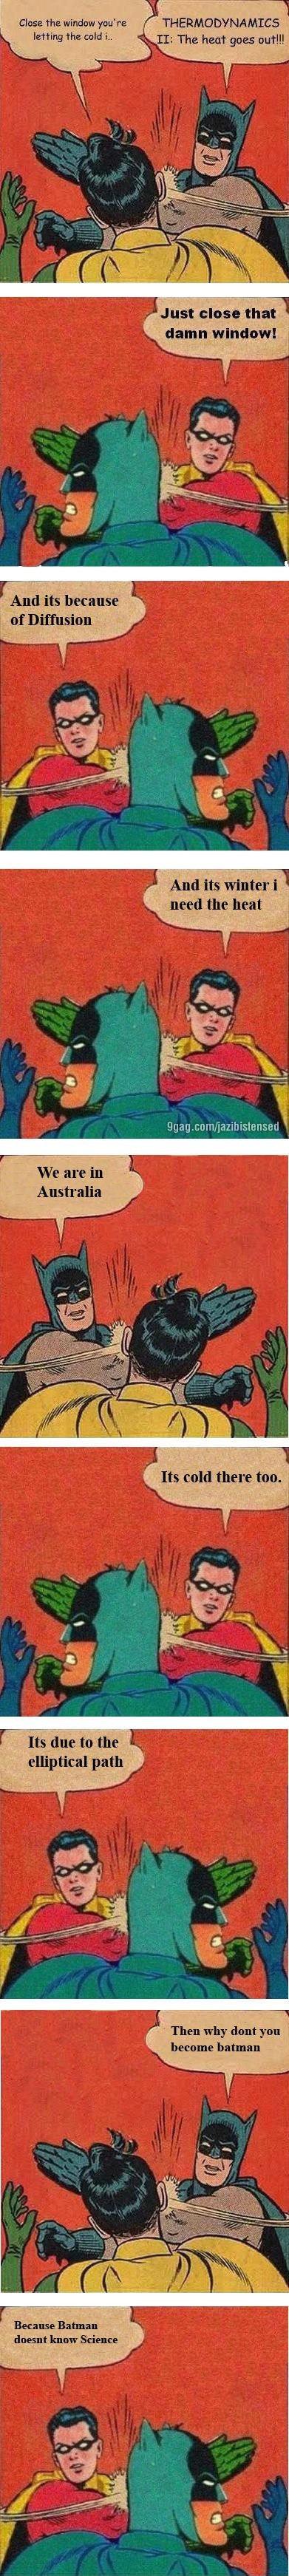 Batman and Robin know scientific shit. . And aiti ! lloll, Kill _ neg?! thesheet MII an tn. -the Then why dint became batman Hanna: Bataan